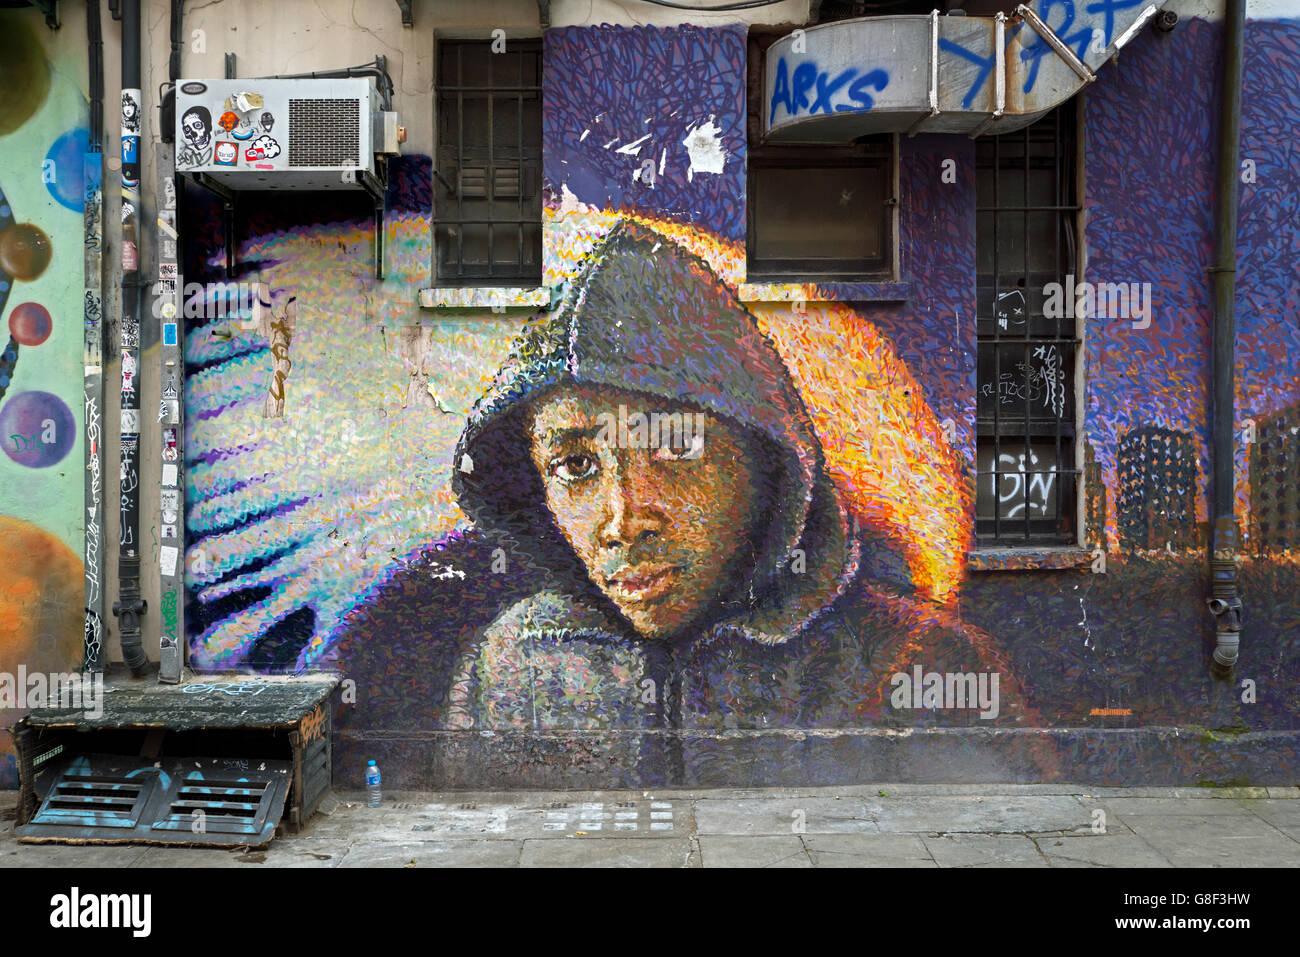 Portrait by street artist  James Cochran  in Whitby Street, Shoreditch, East London, UK. - Stock Image